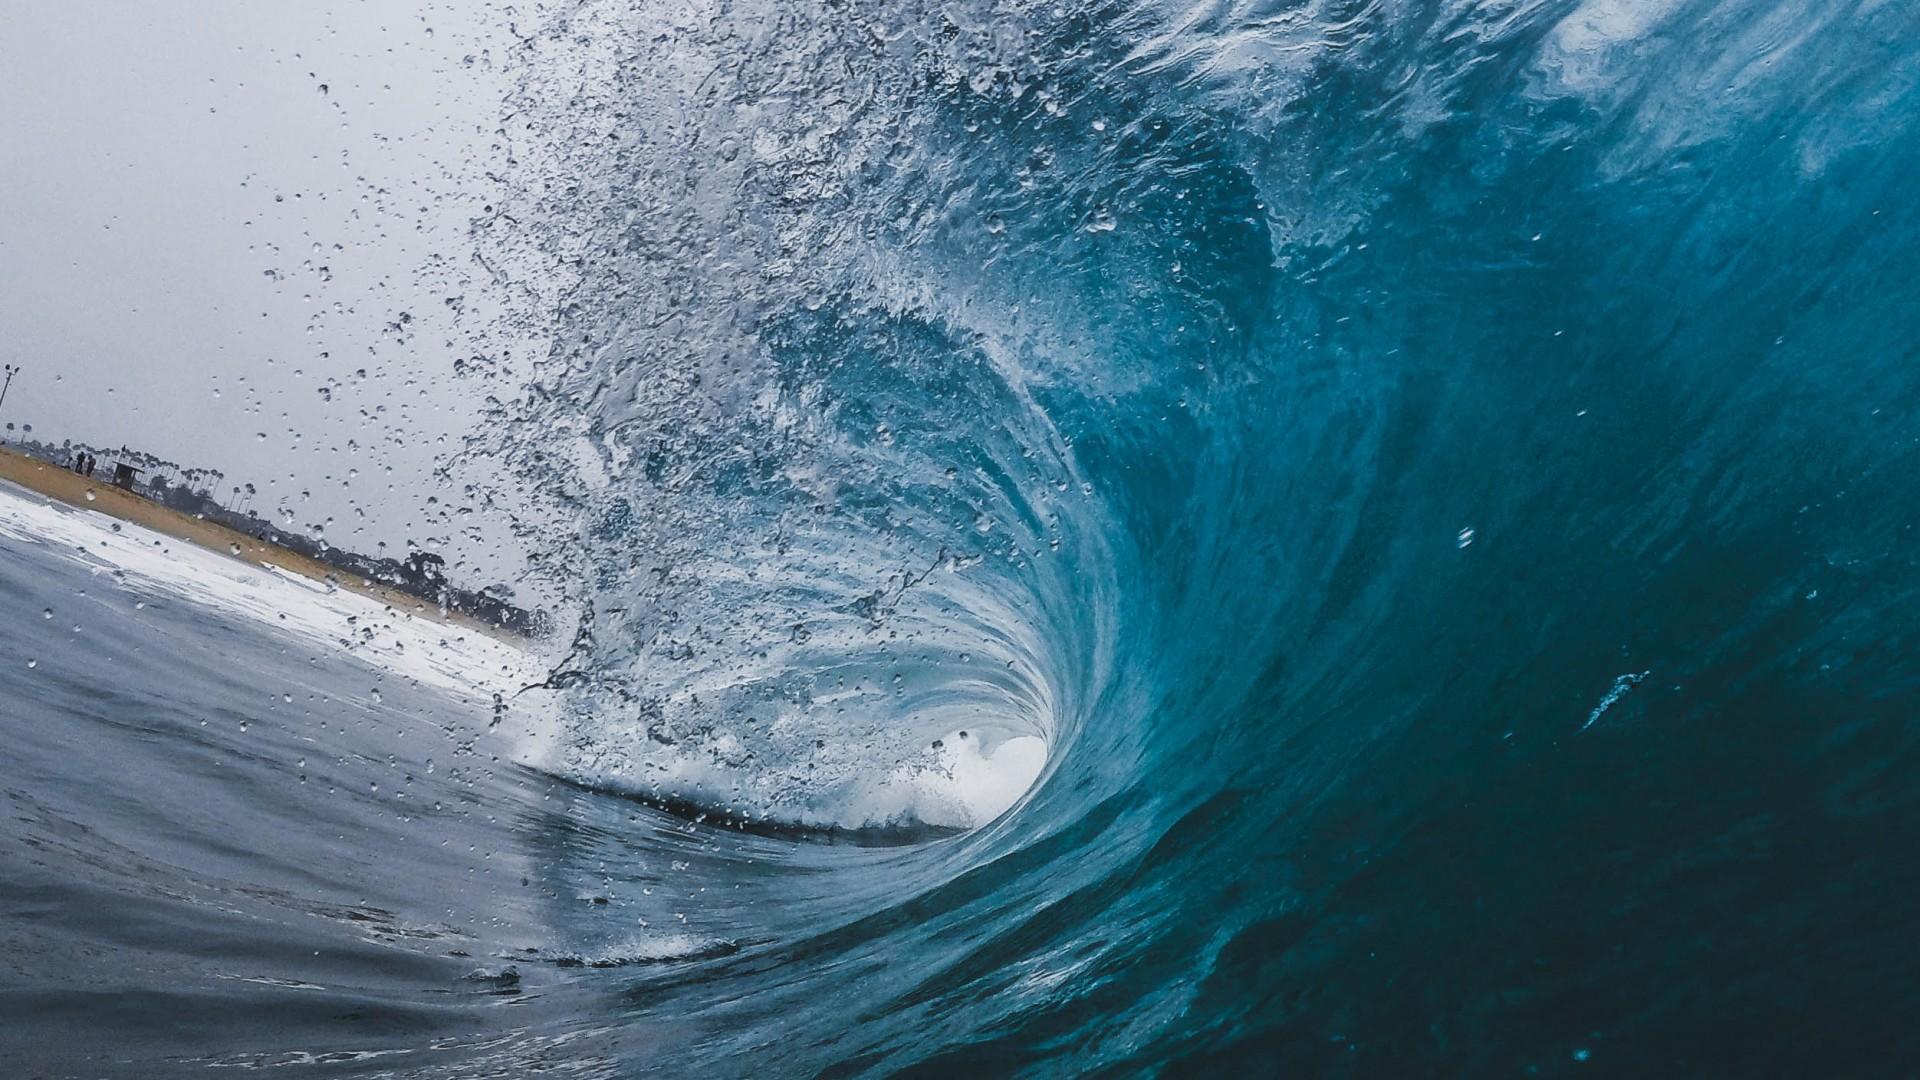 Preview wallpaper wave, ocean, spray 1920×1080